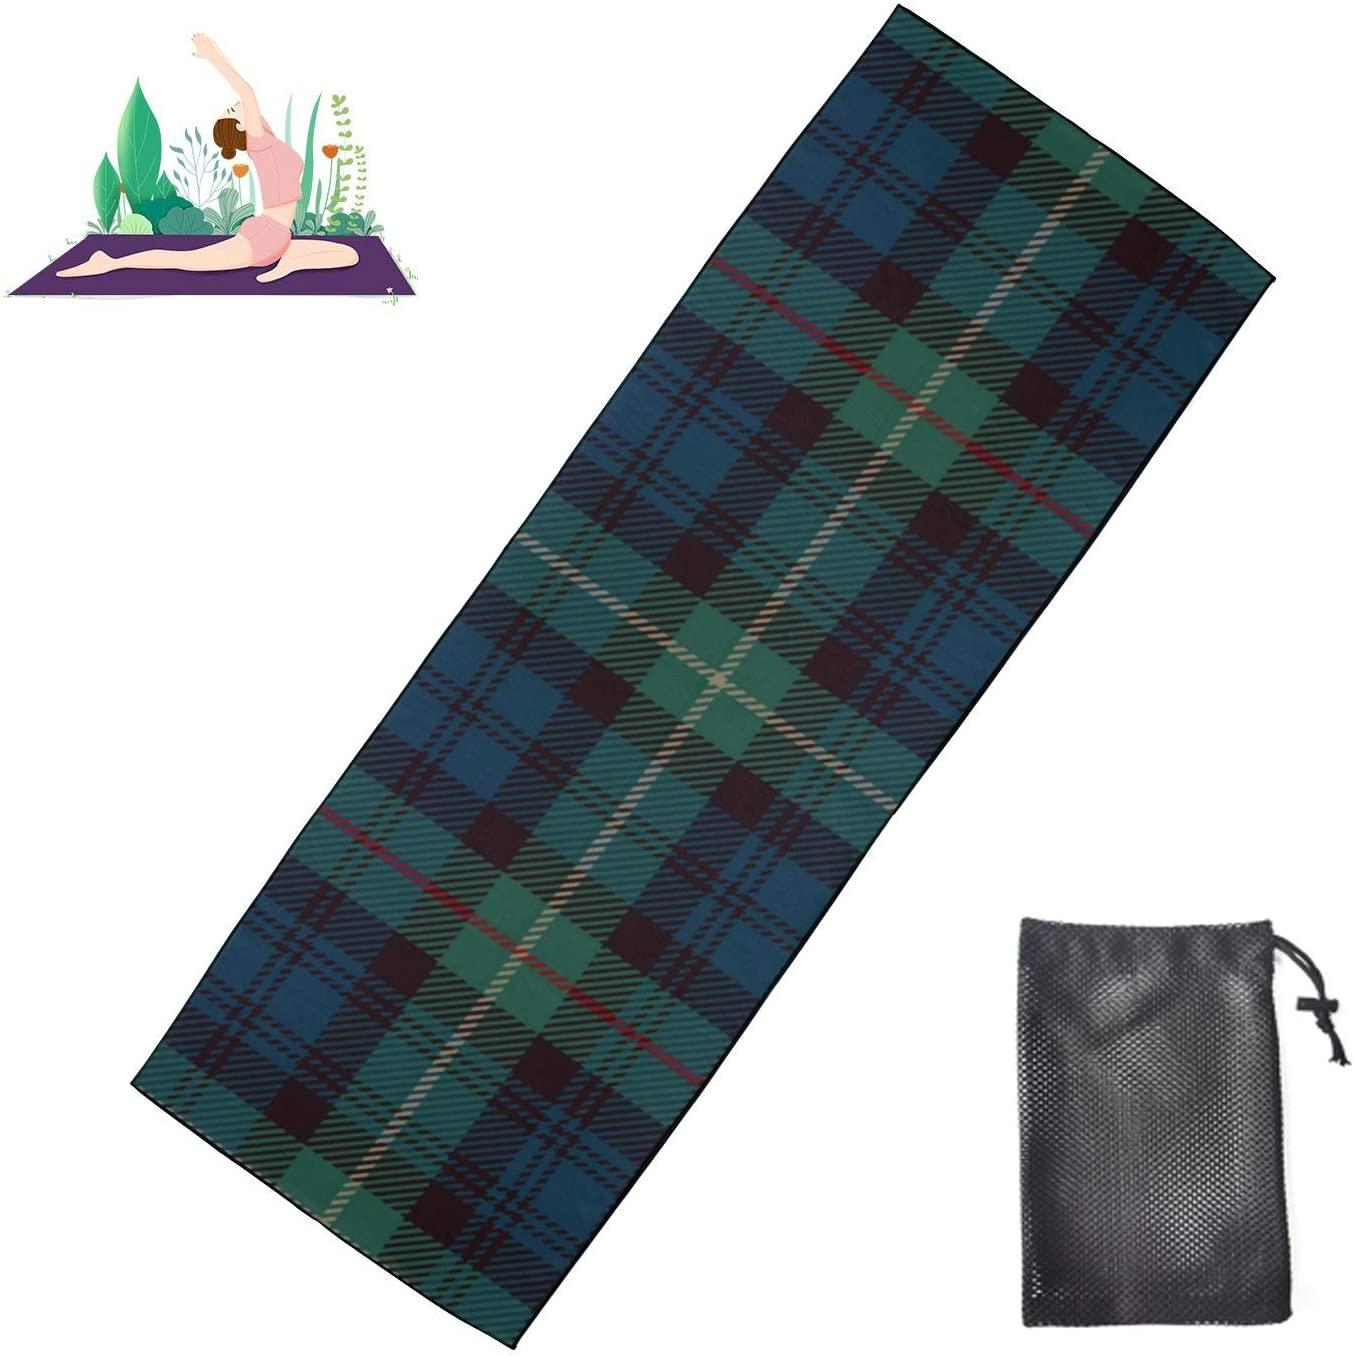 JGYJF Modern Yoga Mat Tartan Blue Black Cute Yoga Mat Microfiber Super Soft and Sweat Absorbent, Ideal for Hot Yoga, Pilates and Workout